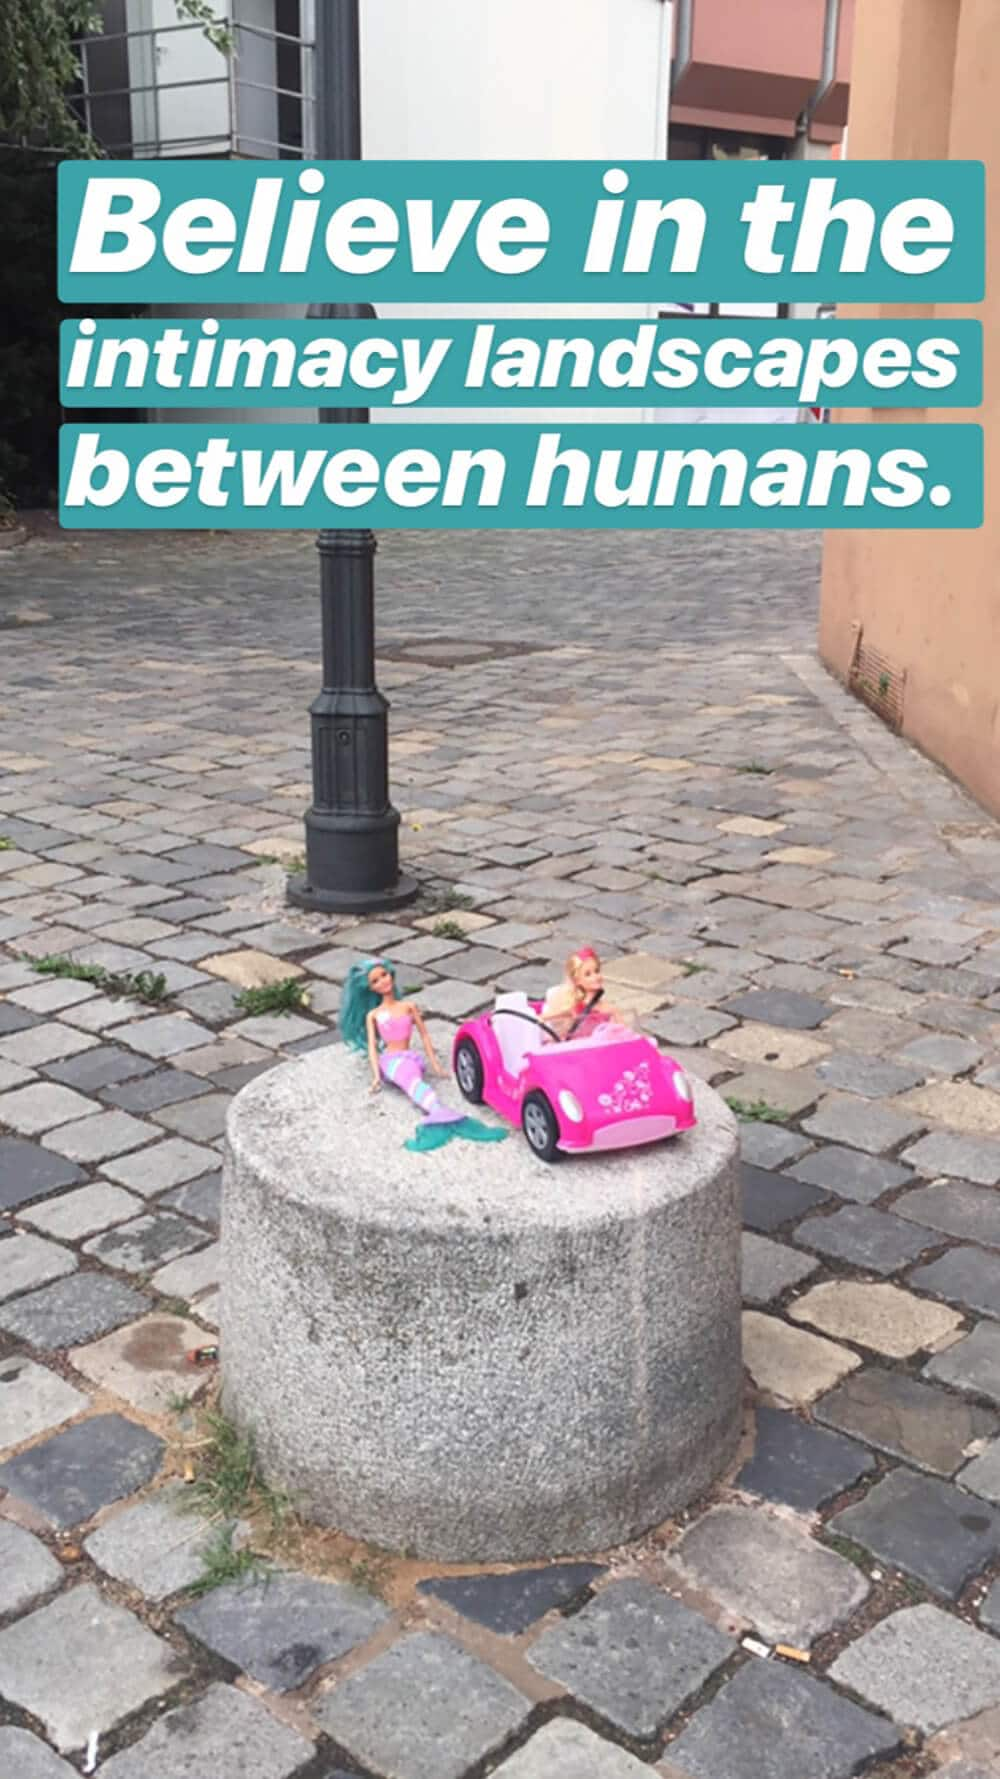 human trust -Serie, © Moni Gropper, 2019